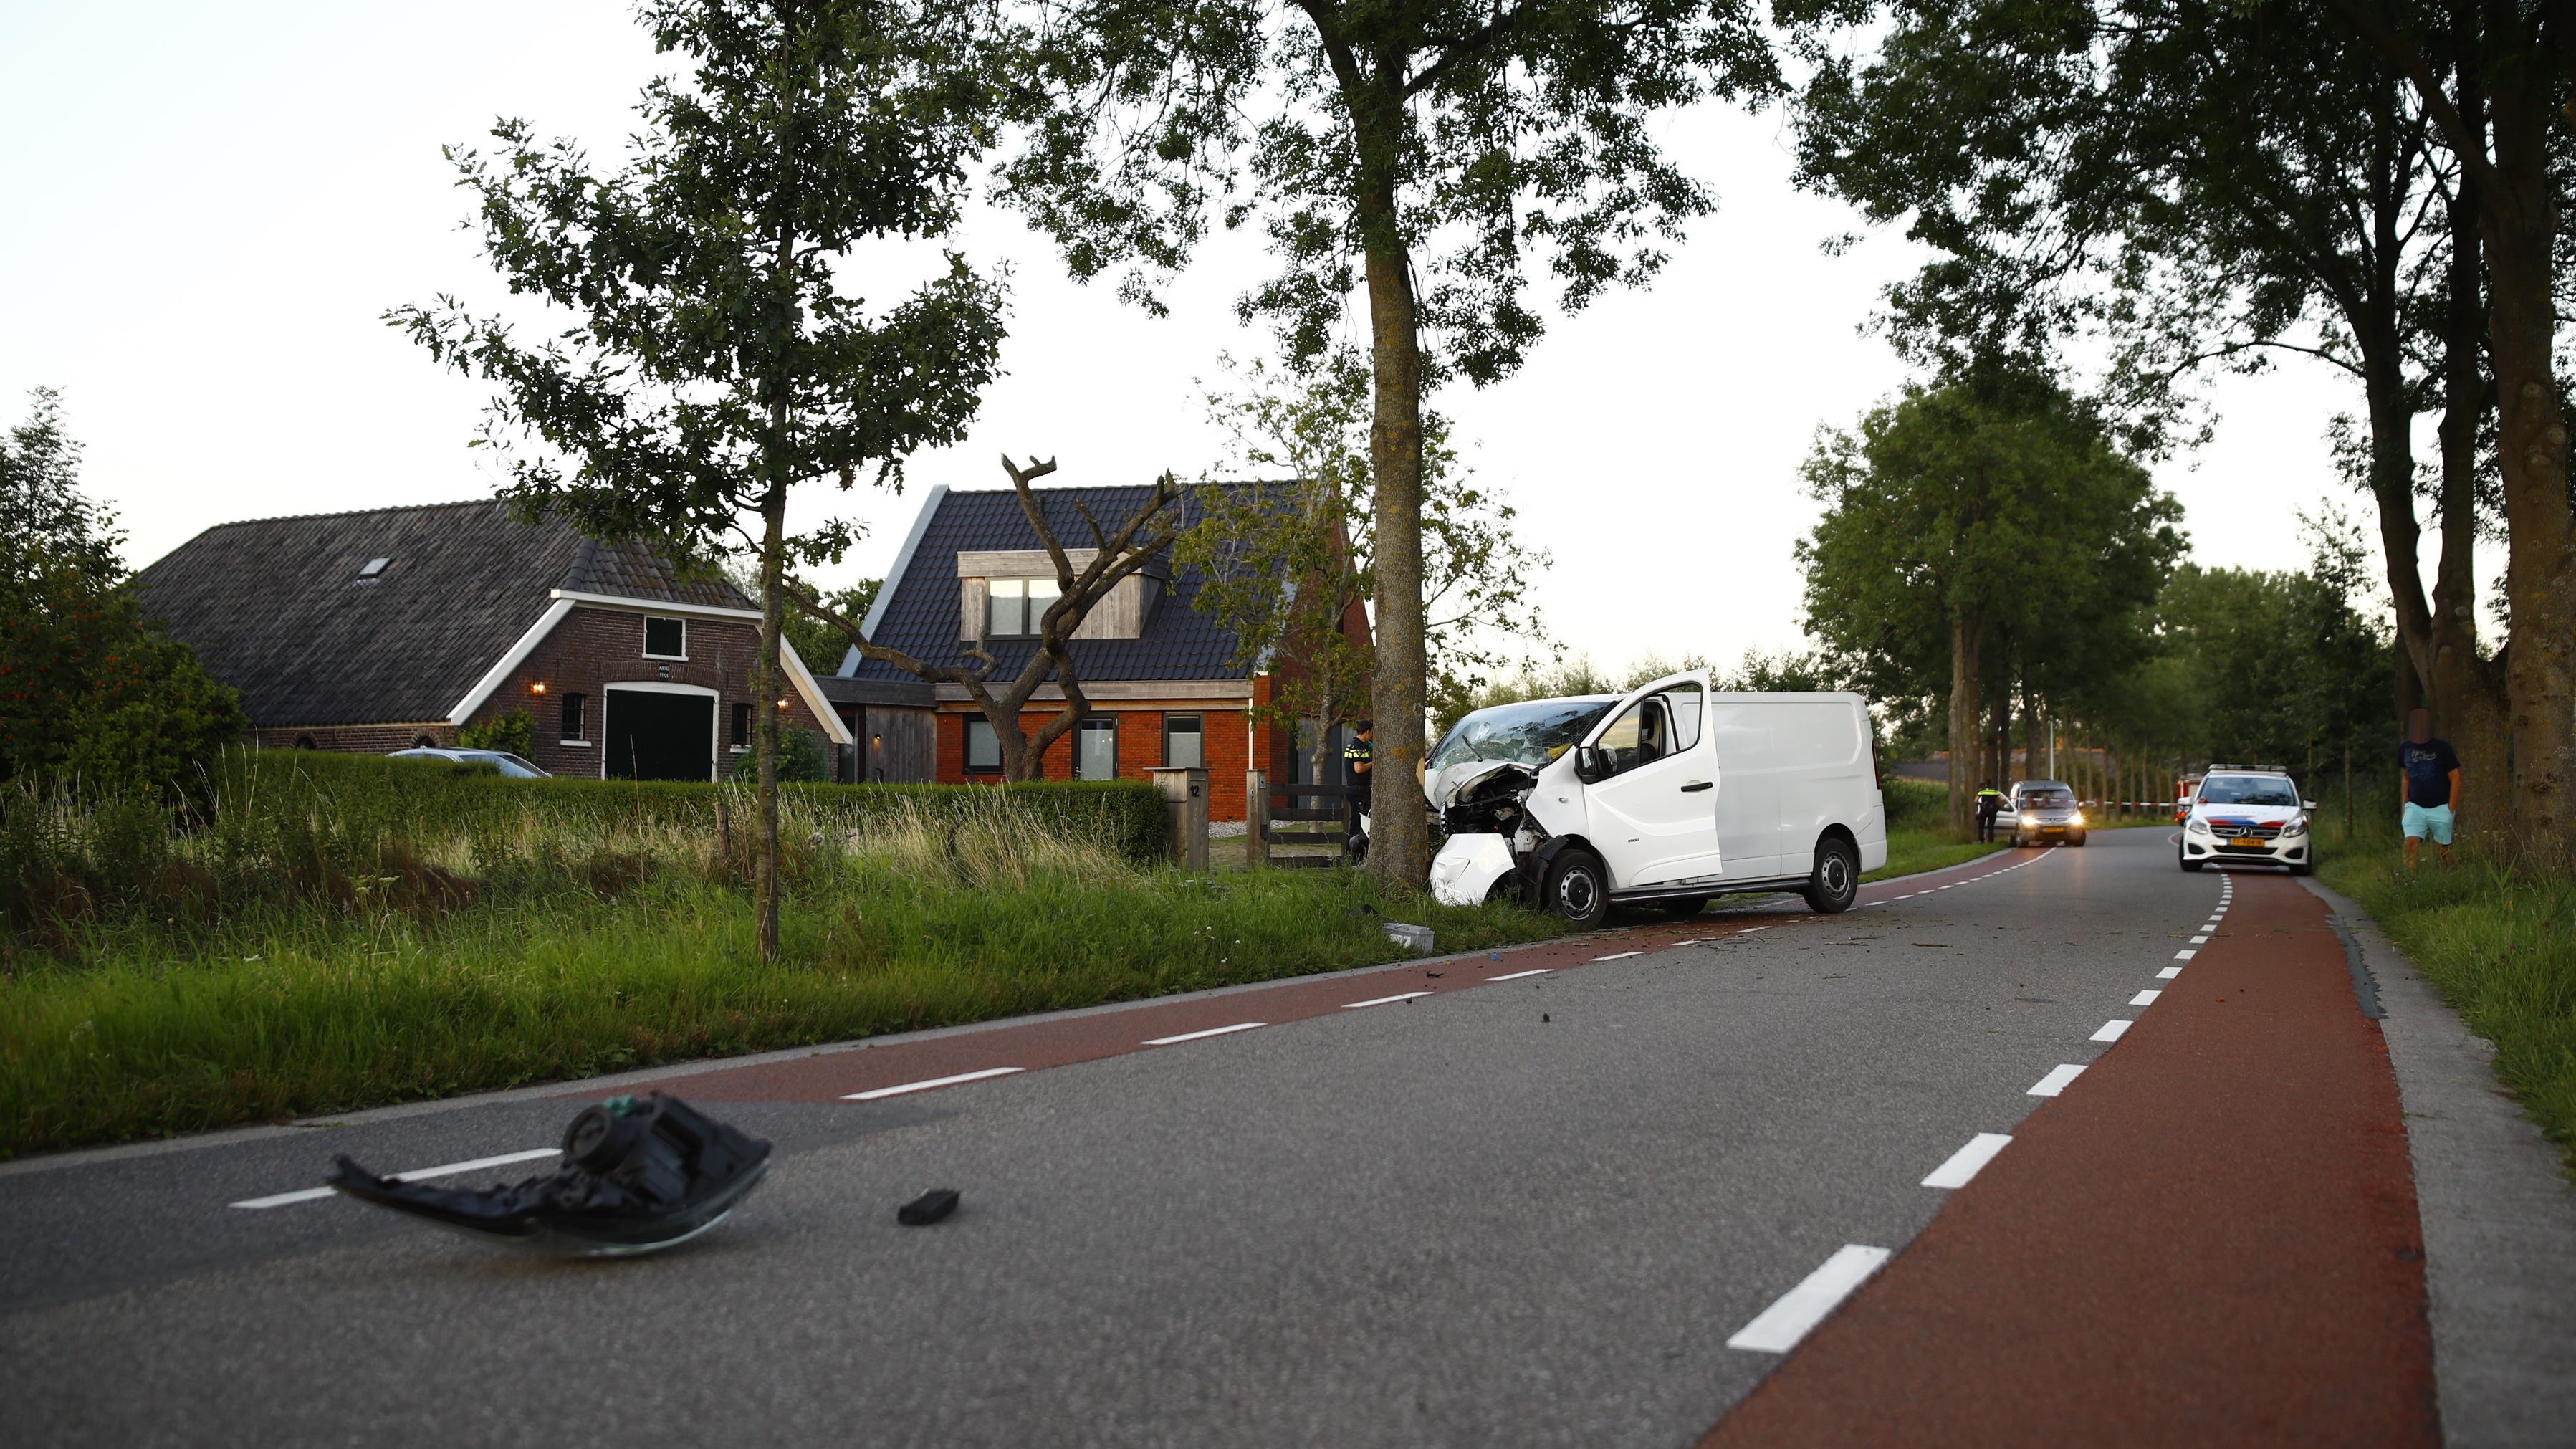 Bestuurder busje zwaargewond na botsing tegen boom bij Zwolle.